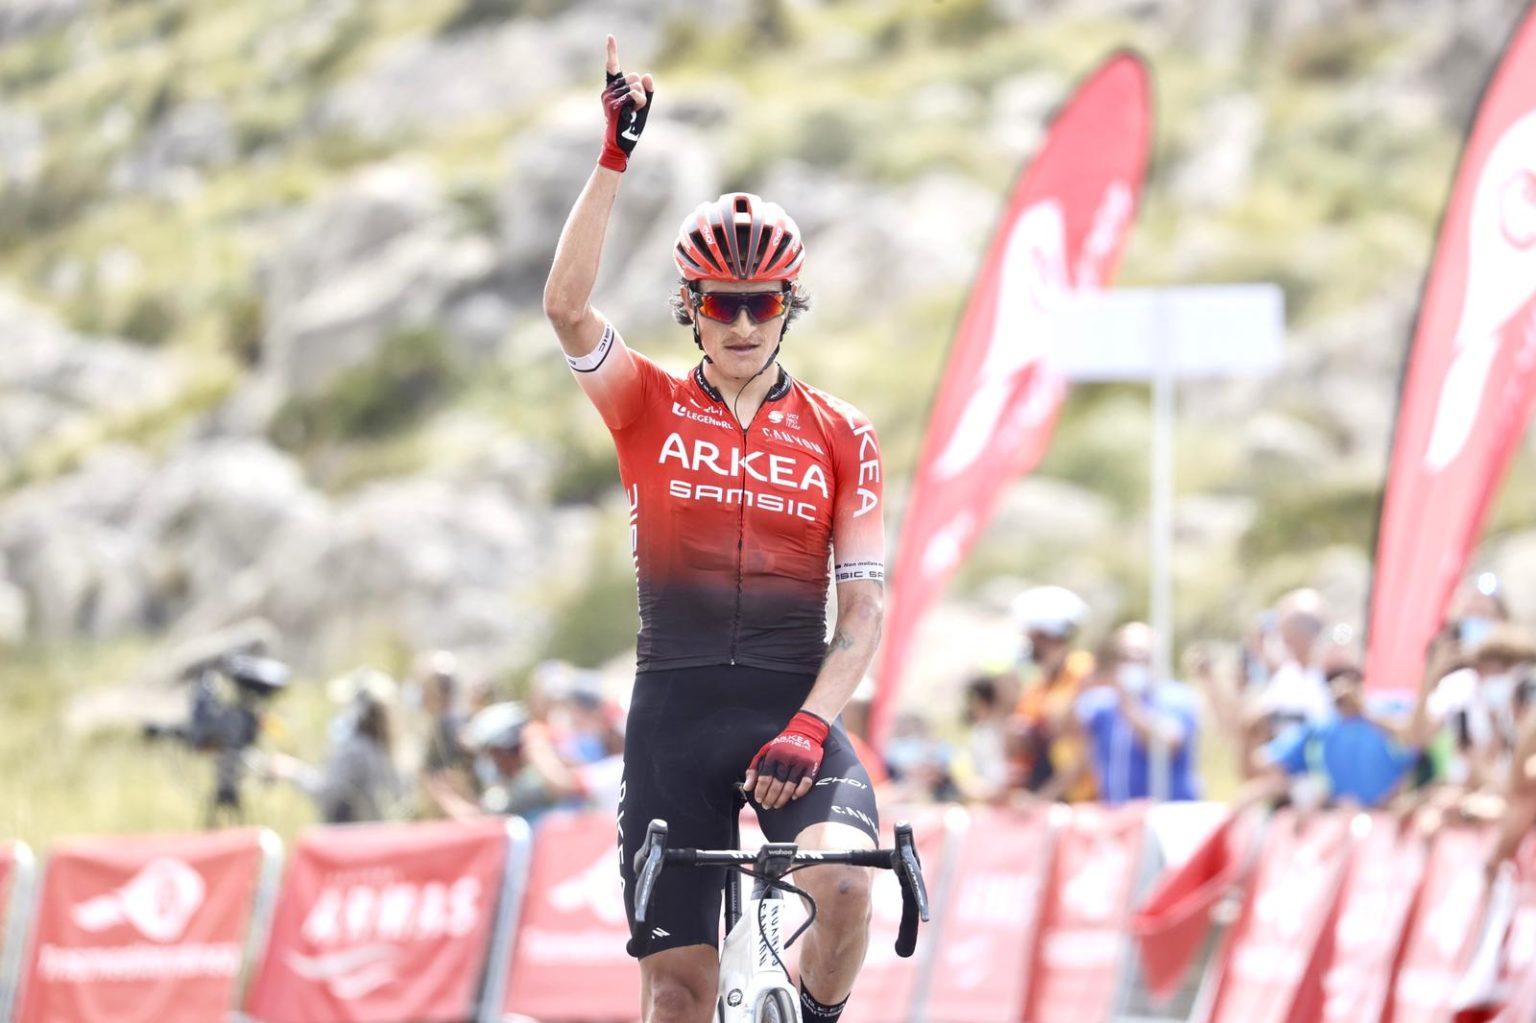 Victoire de Winner Anacona au sommet du Mirador de Colomer